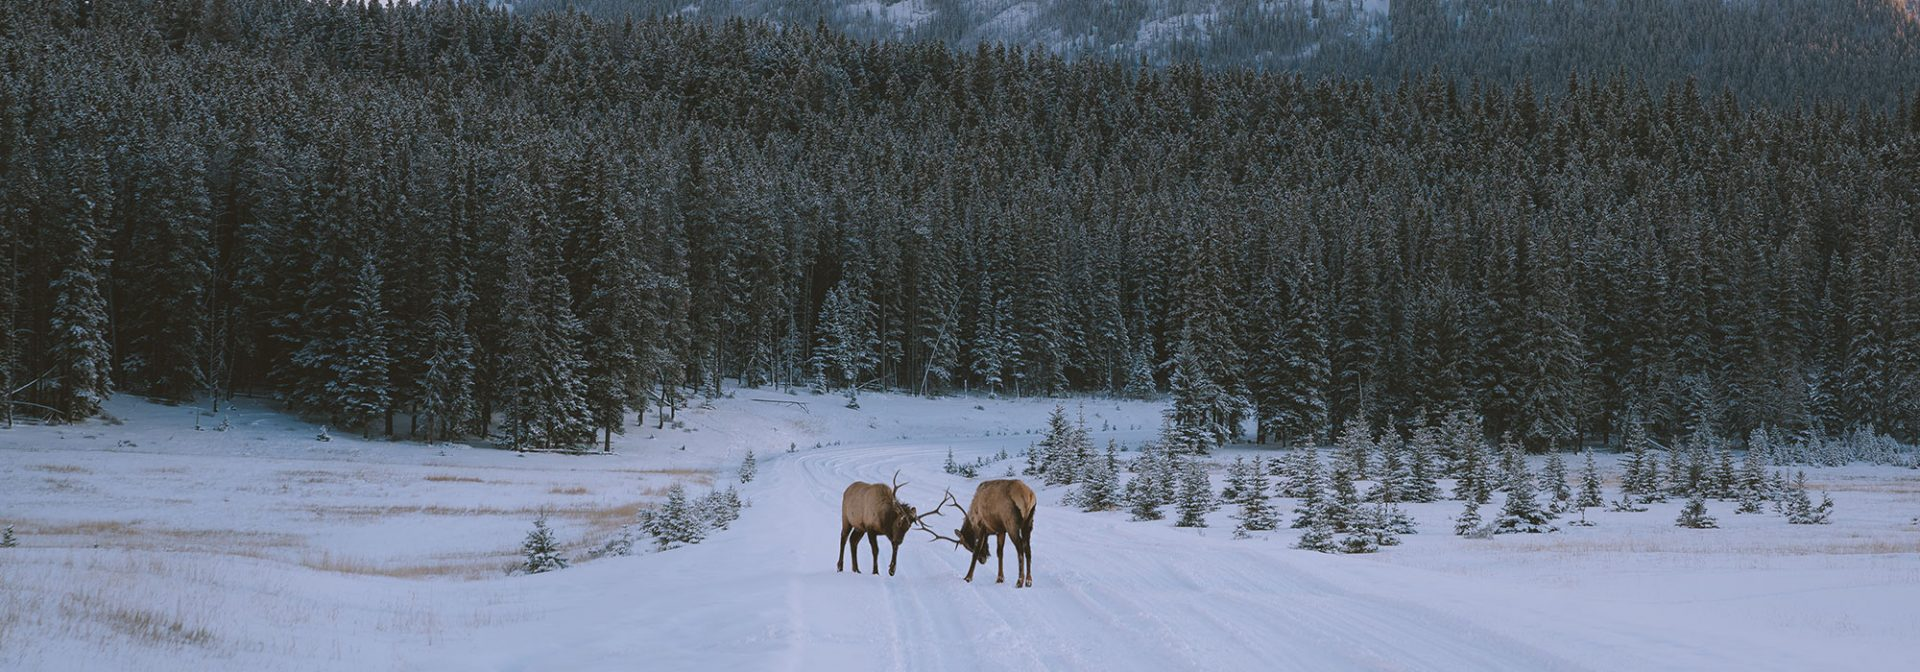 Elk on the road to Two Jack Lake. Photo by Jason Hill @jasoncharleshill